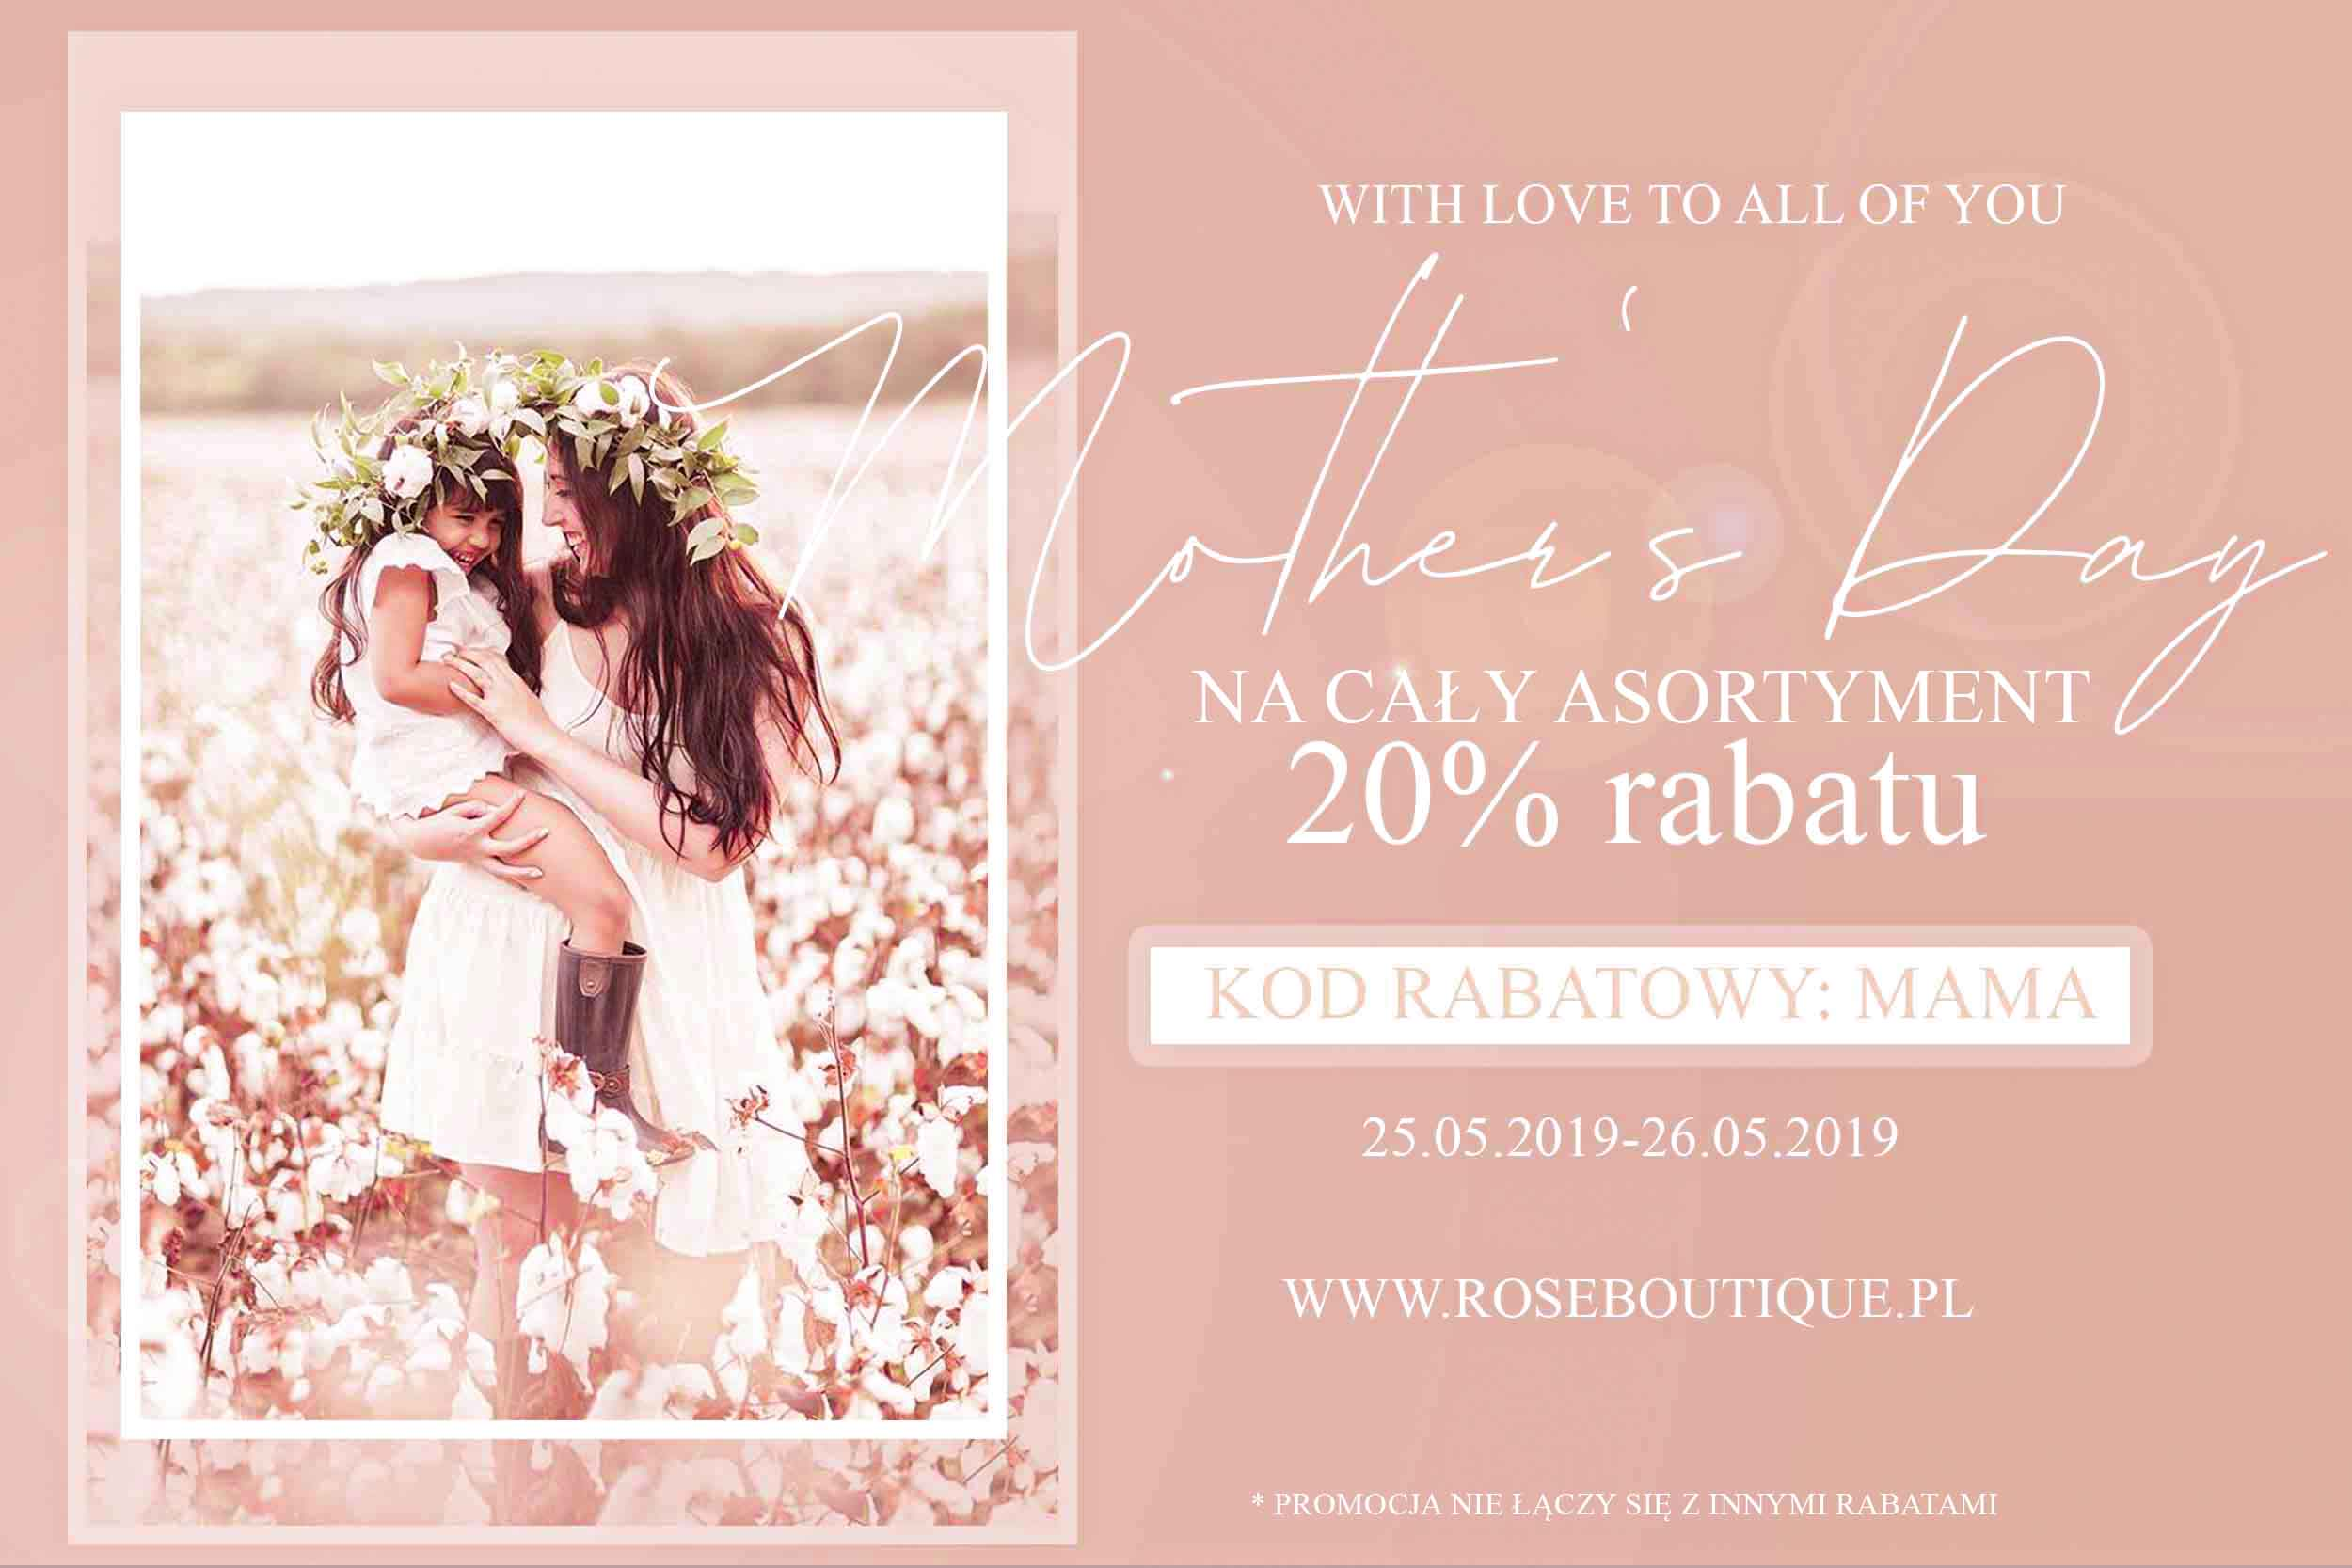 1f9571486e Butik ROSE BOUTIQUE - sklep online - modne i stylowe ubrania dla kobiet